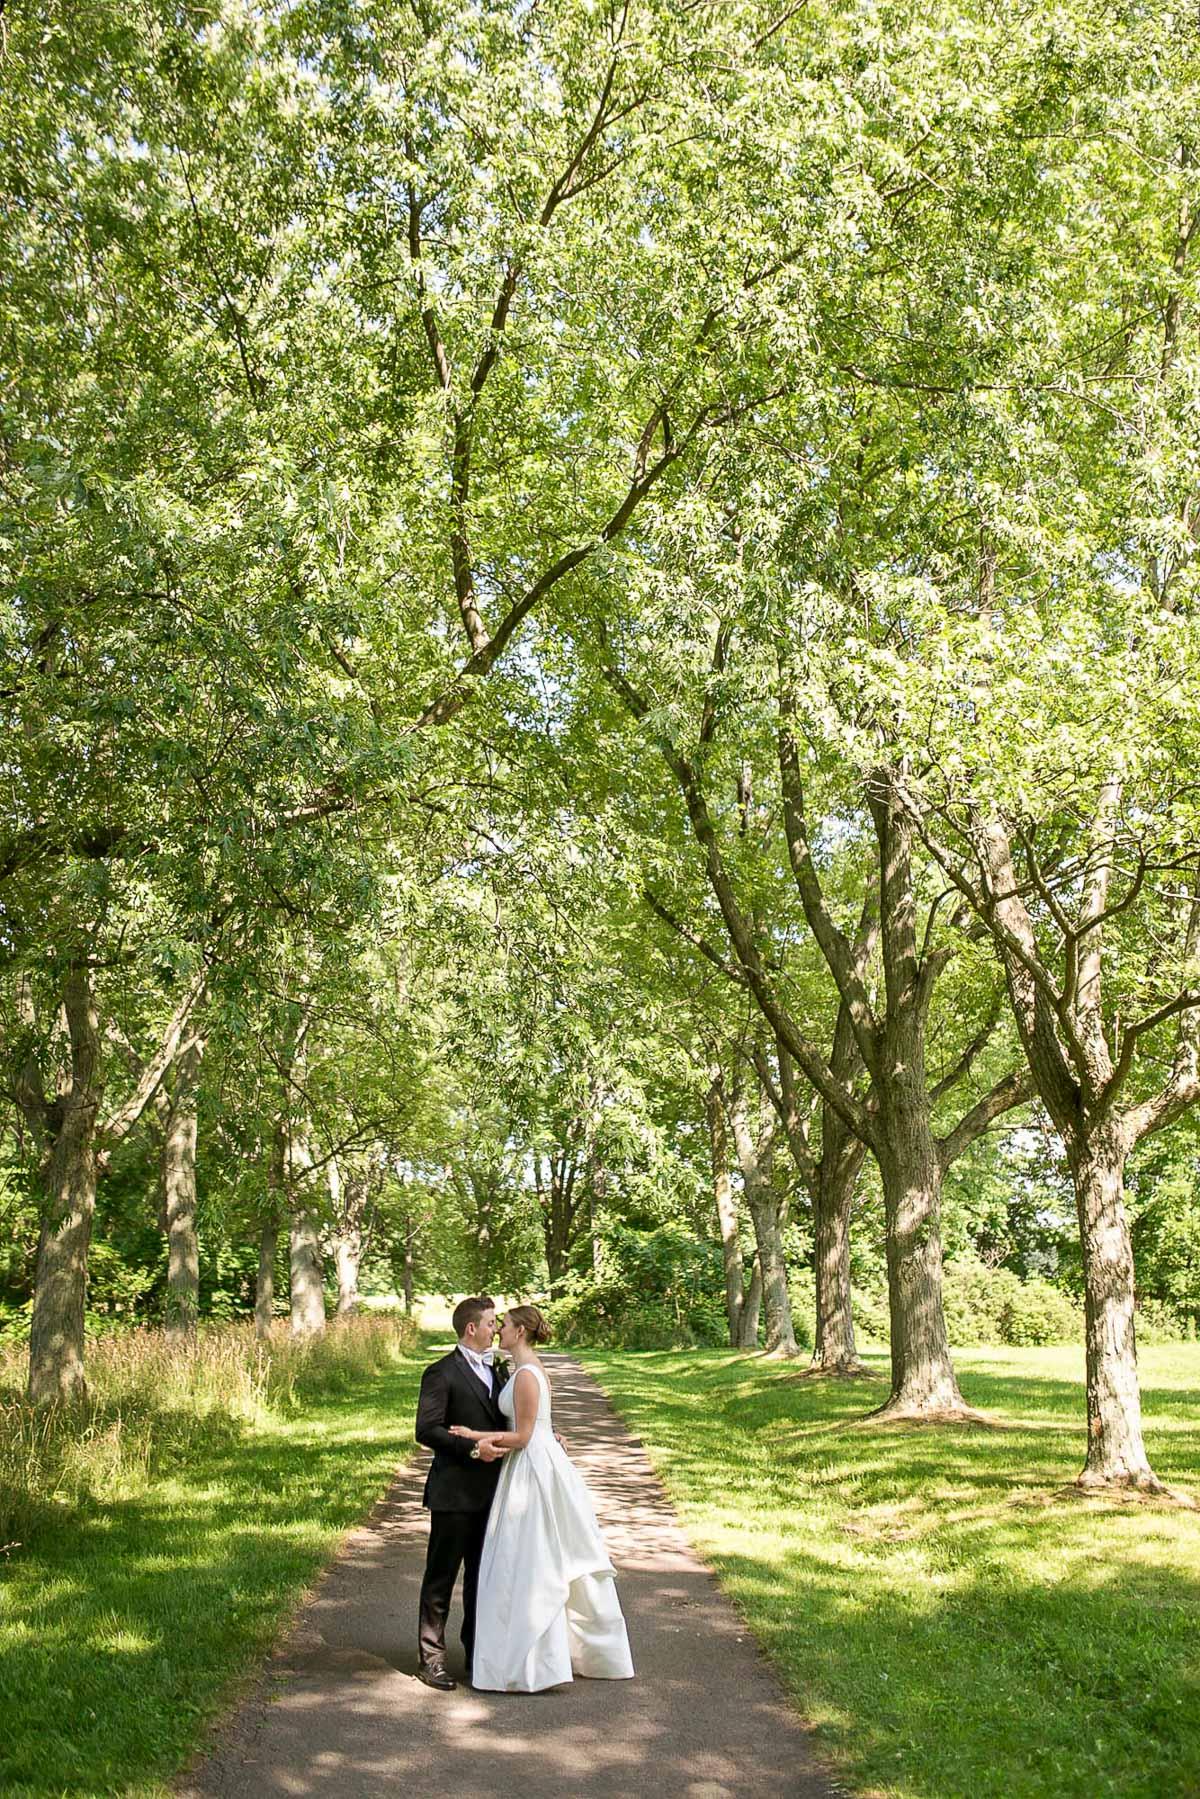 philosophy-studios-vineyard-bride-swish-list-chateau-des-charmes-niagara-on-the-lake-wedding-18.jpg